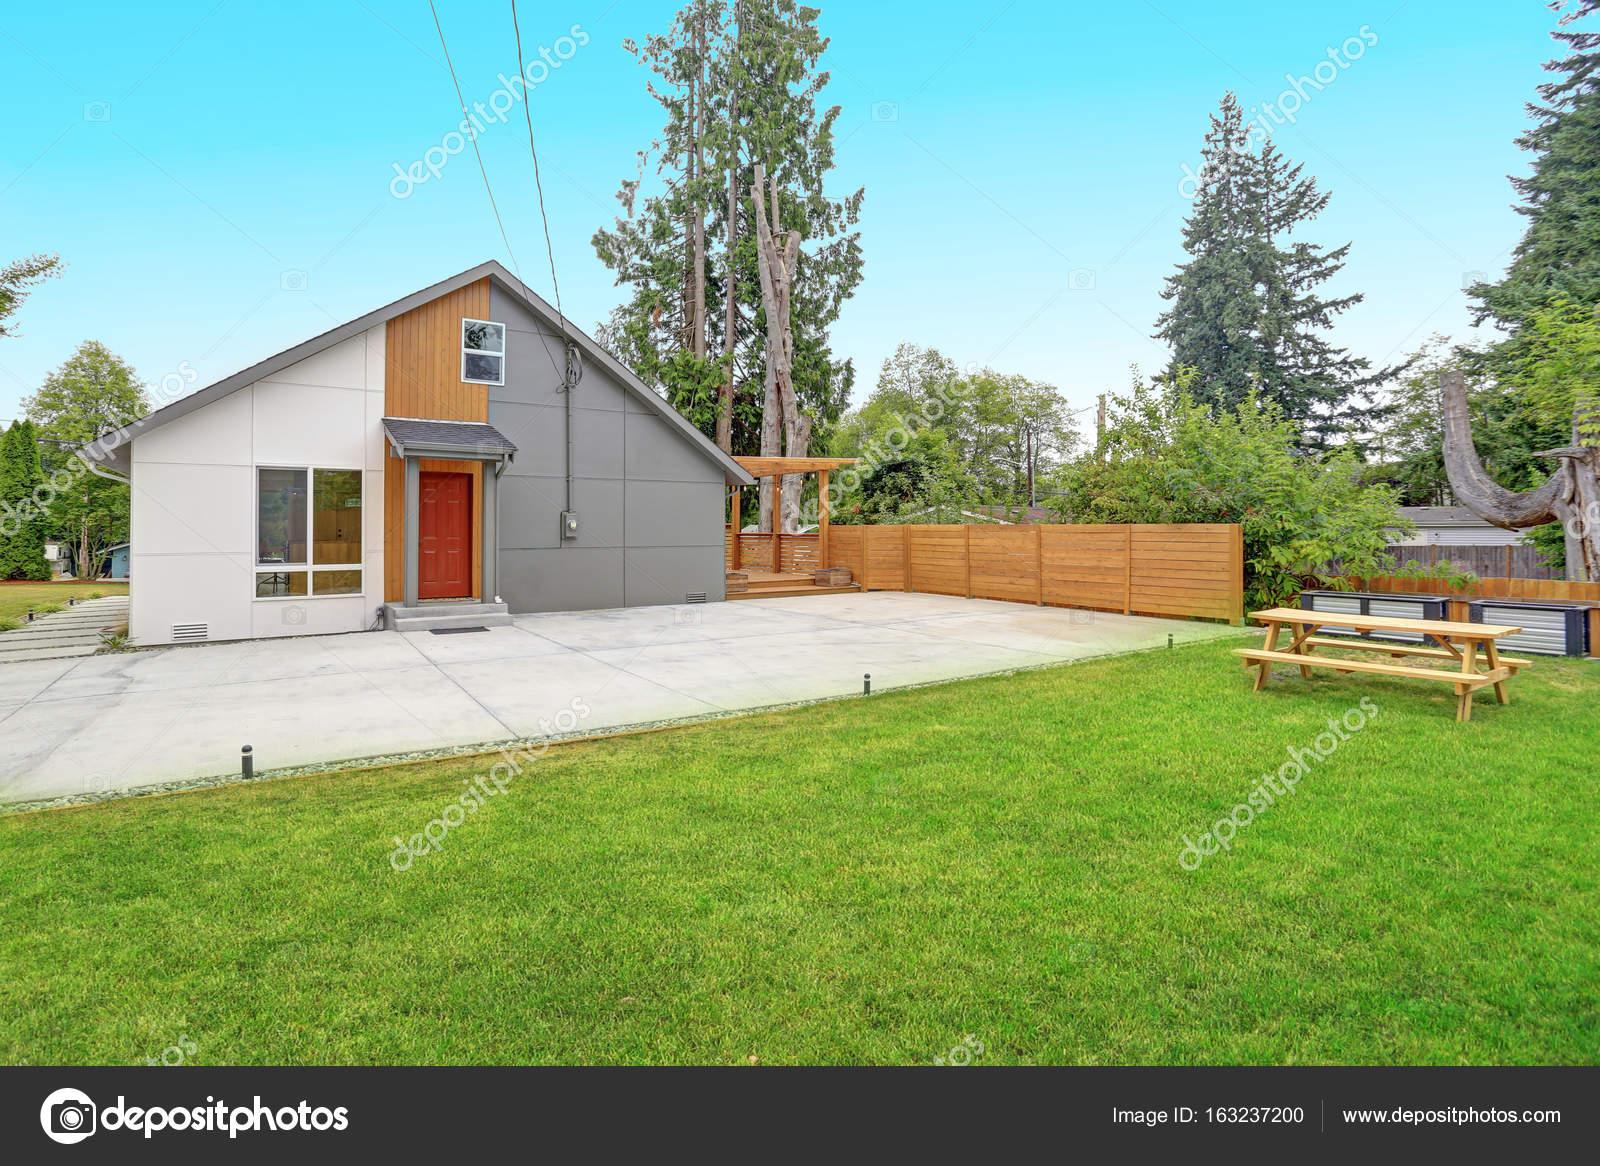 Geheel gerenoveerd modern huis in everett u2014 stockfoto © alabn #163237200